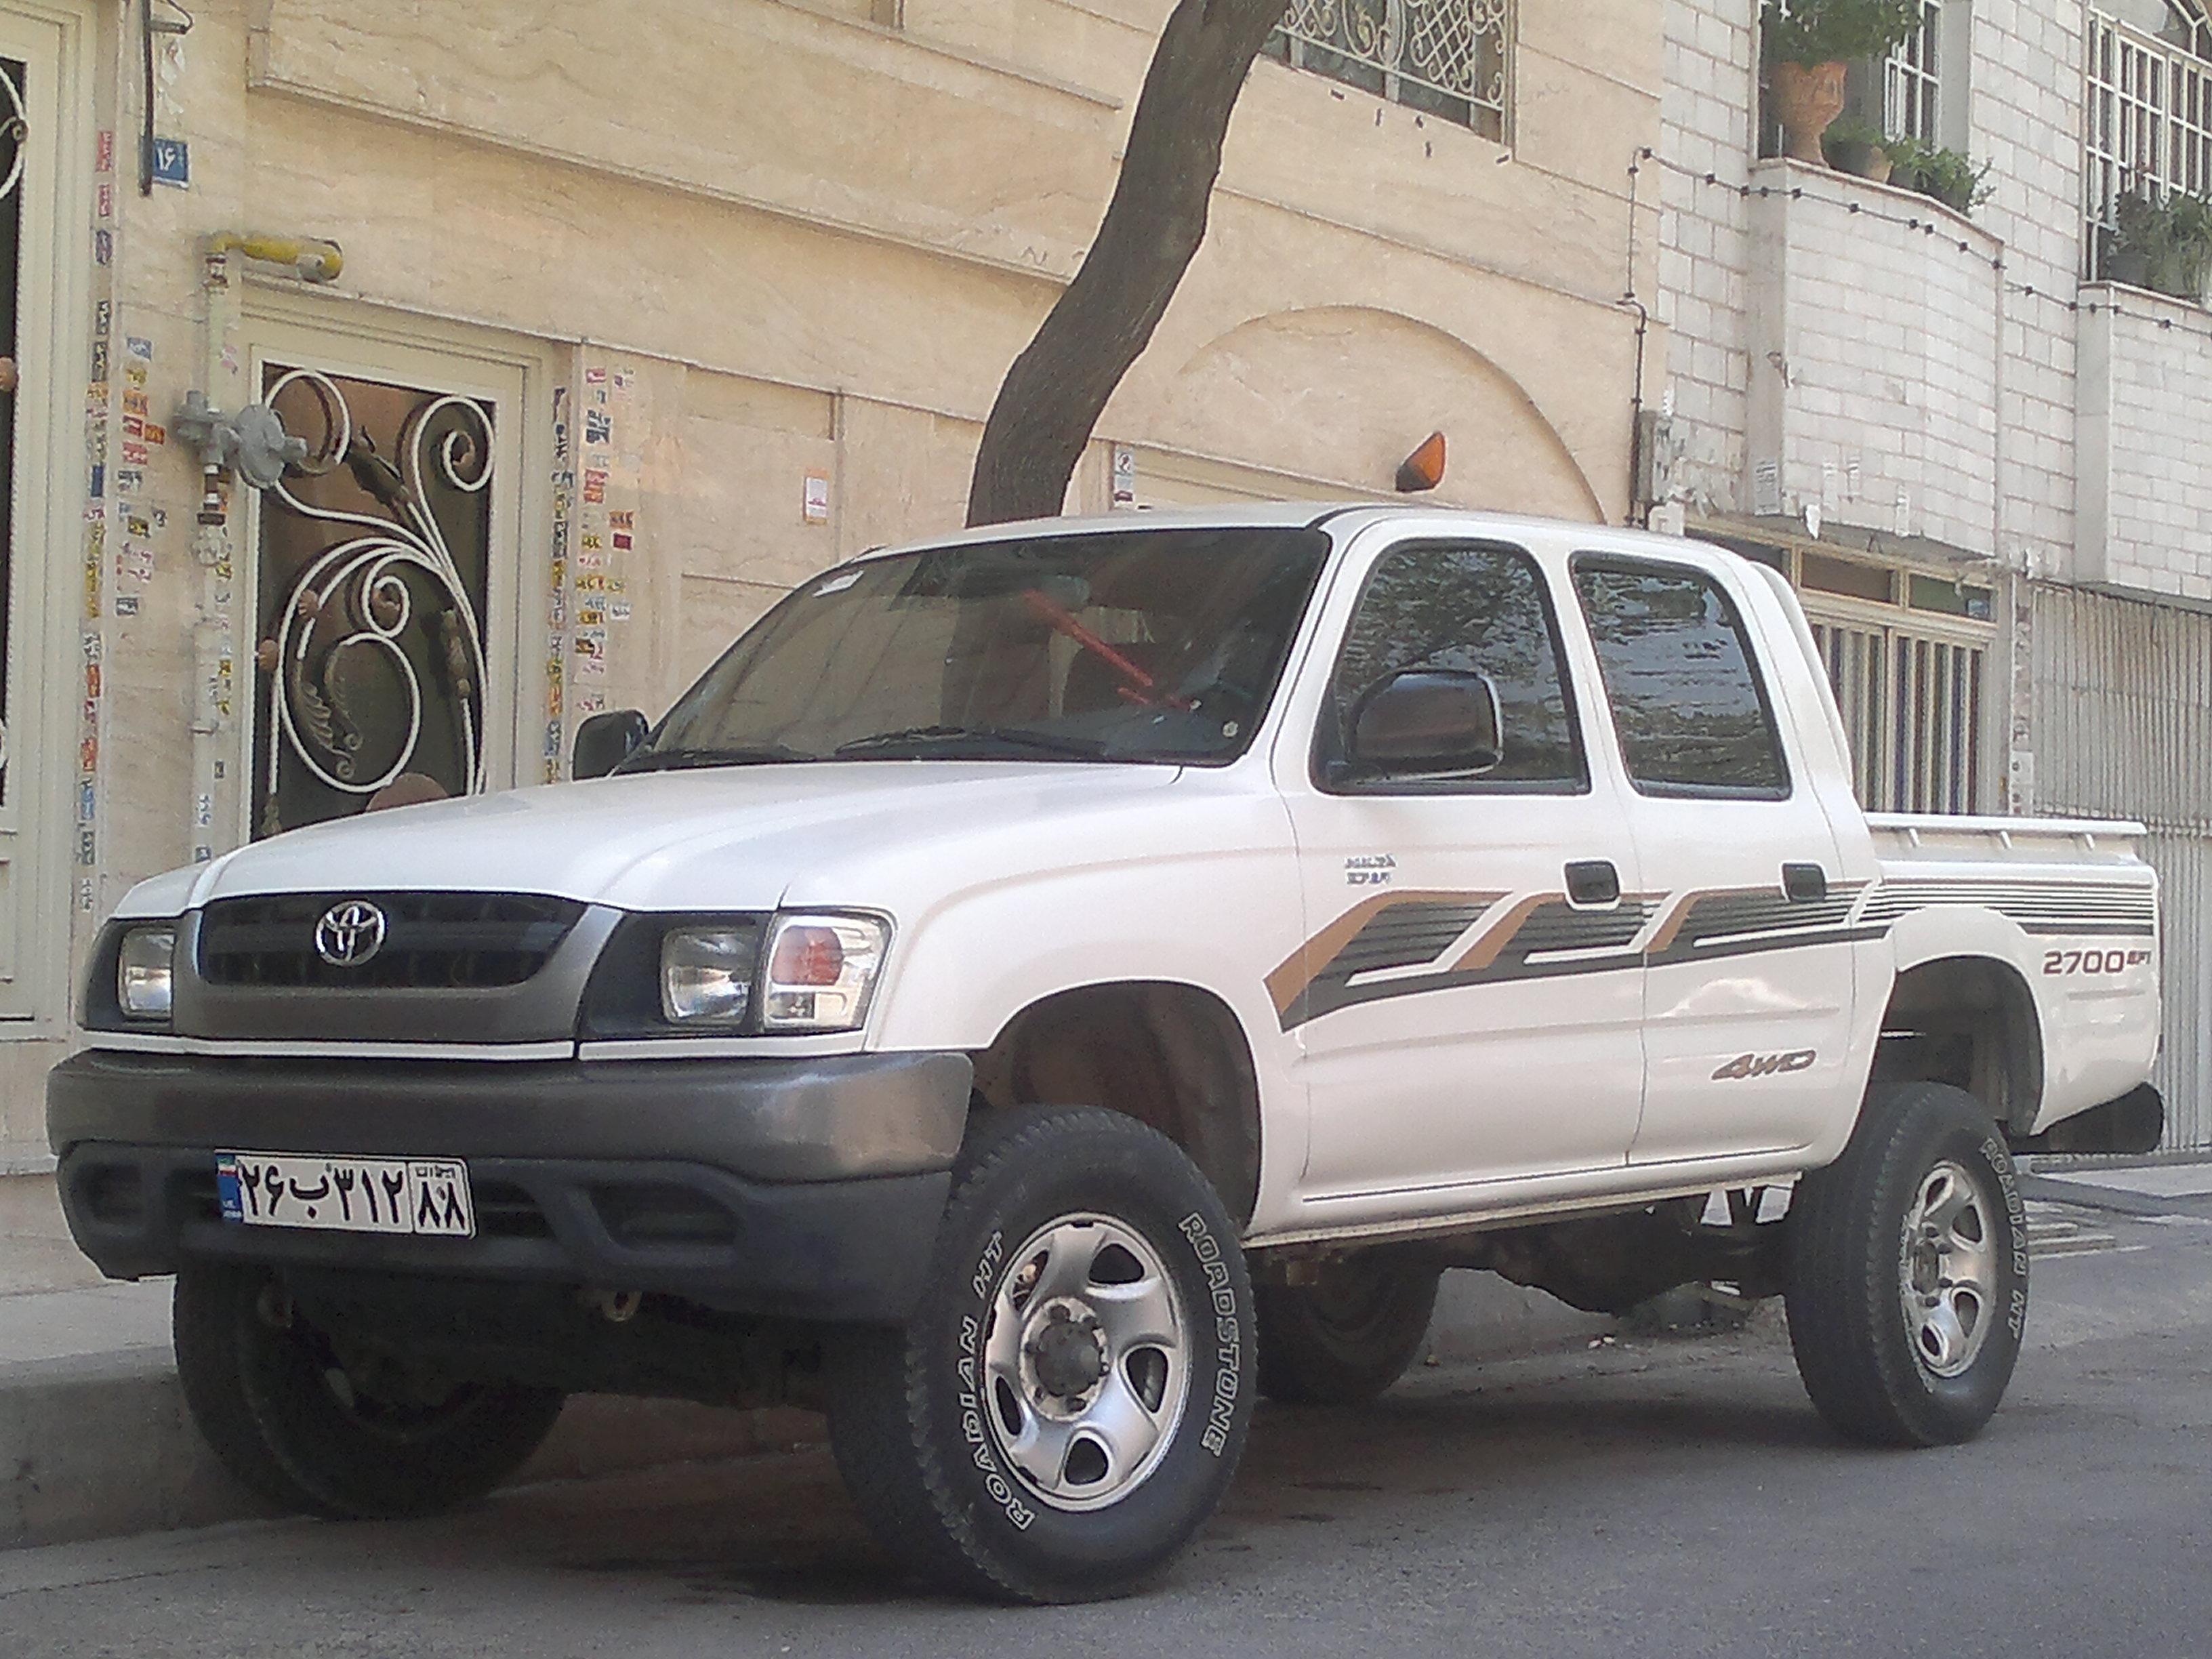 لمر سندری مزایده خودرو نیروی انتظامی